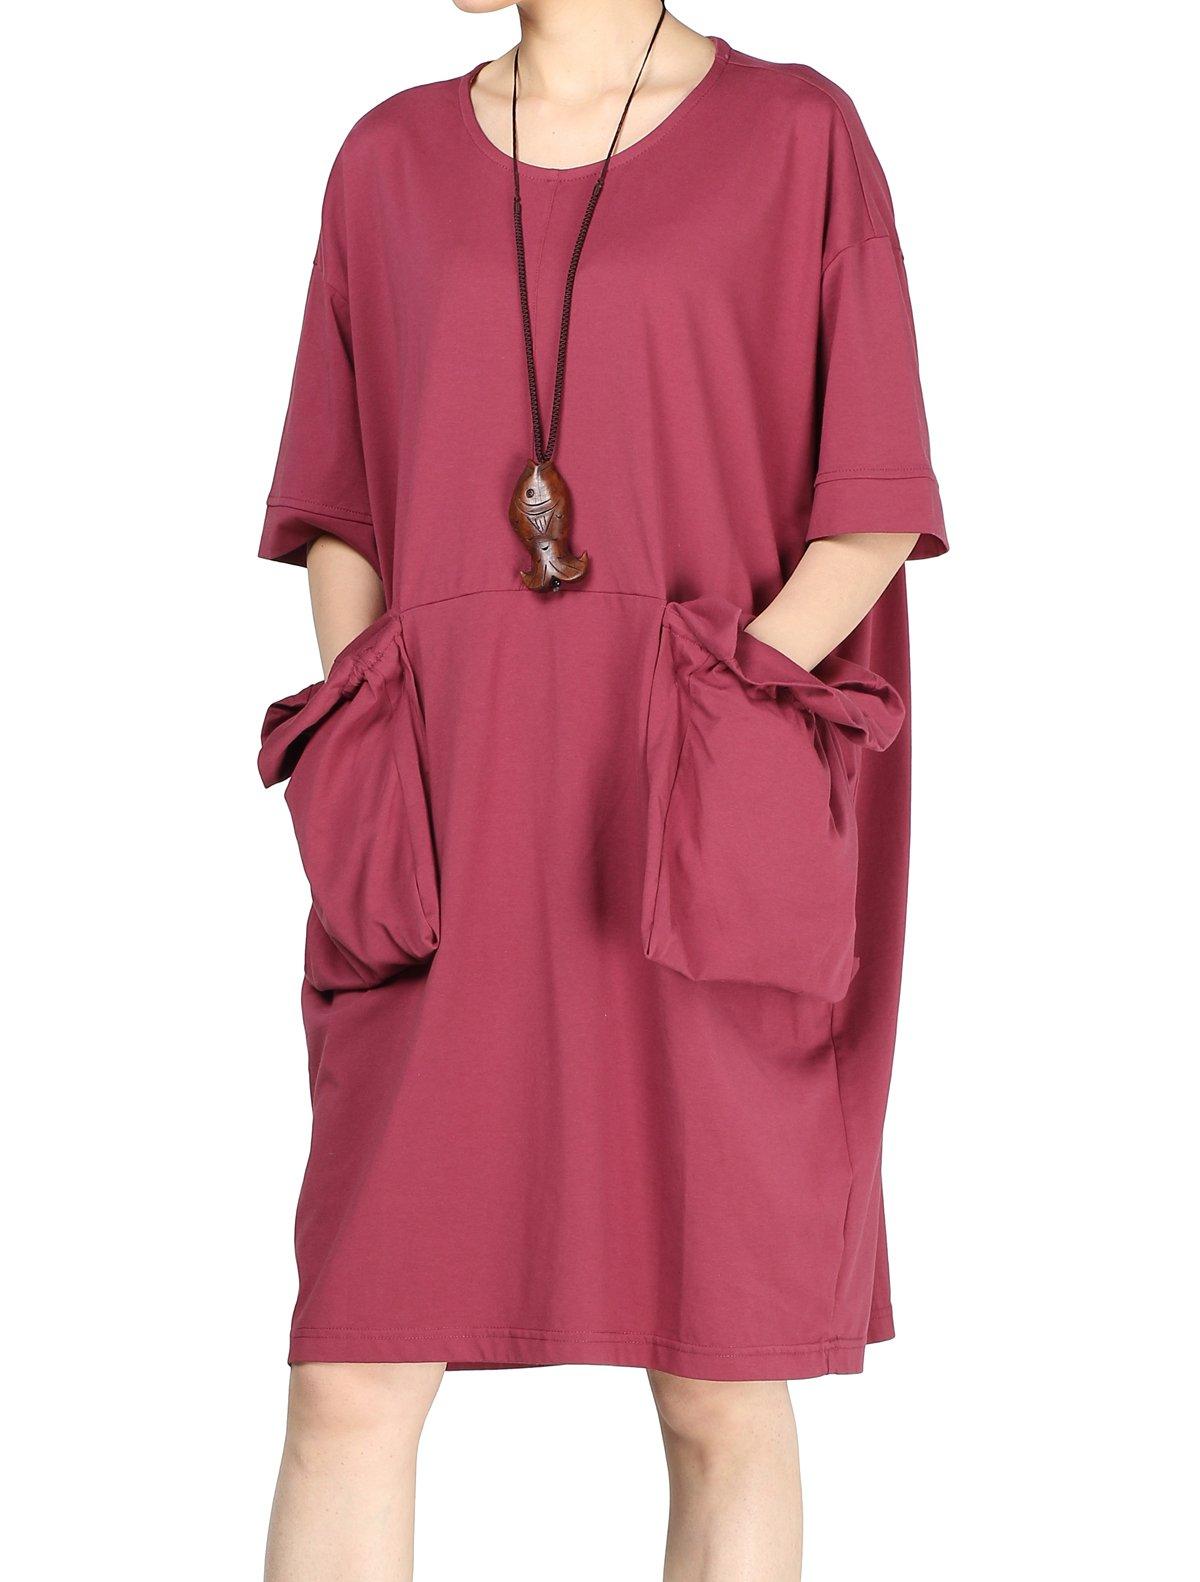 Mordenmiss Women's Plus Size Hoodies Long Sweatshirt Kaftan Dress with Single Pocket Style 3 XL Red